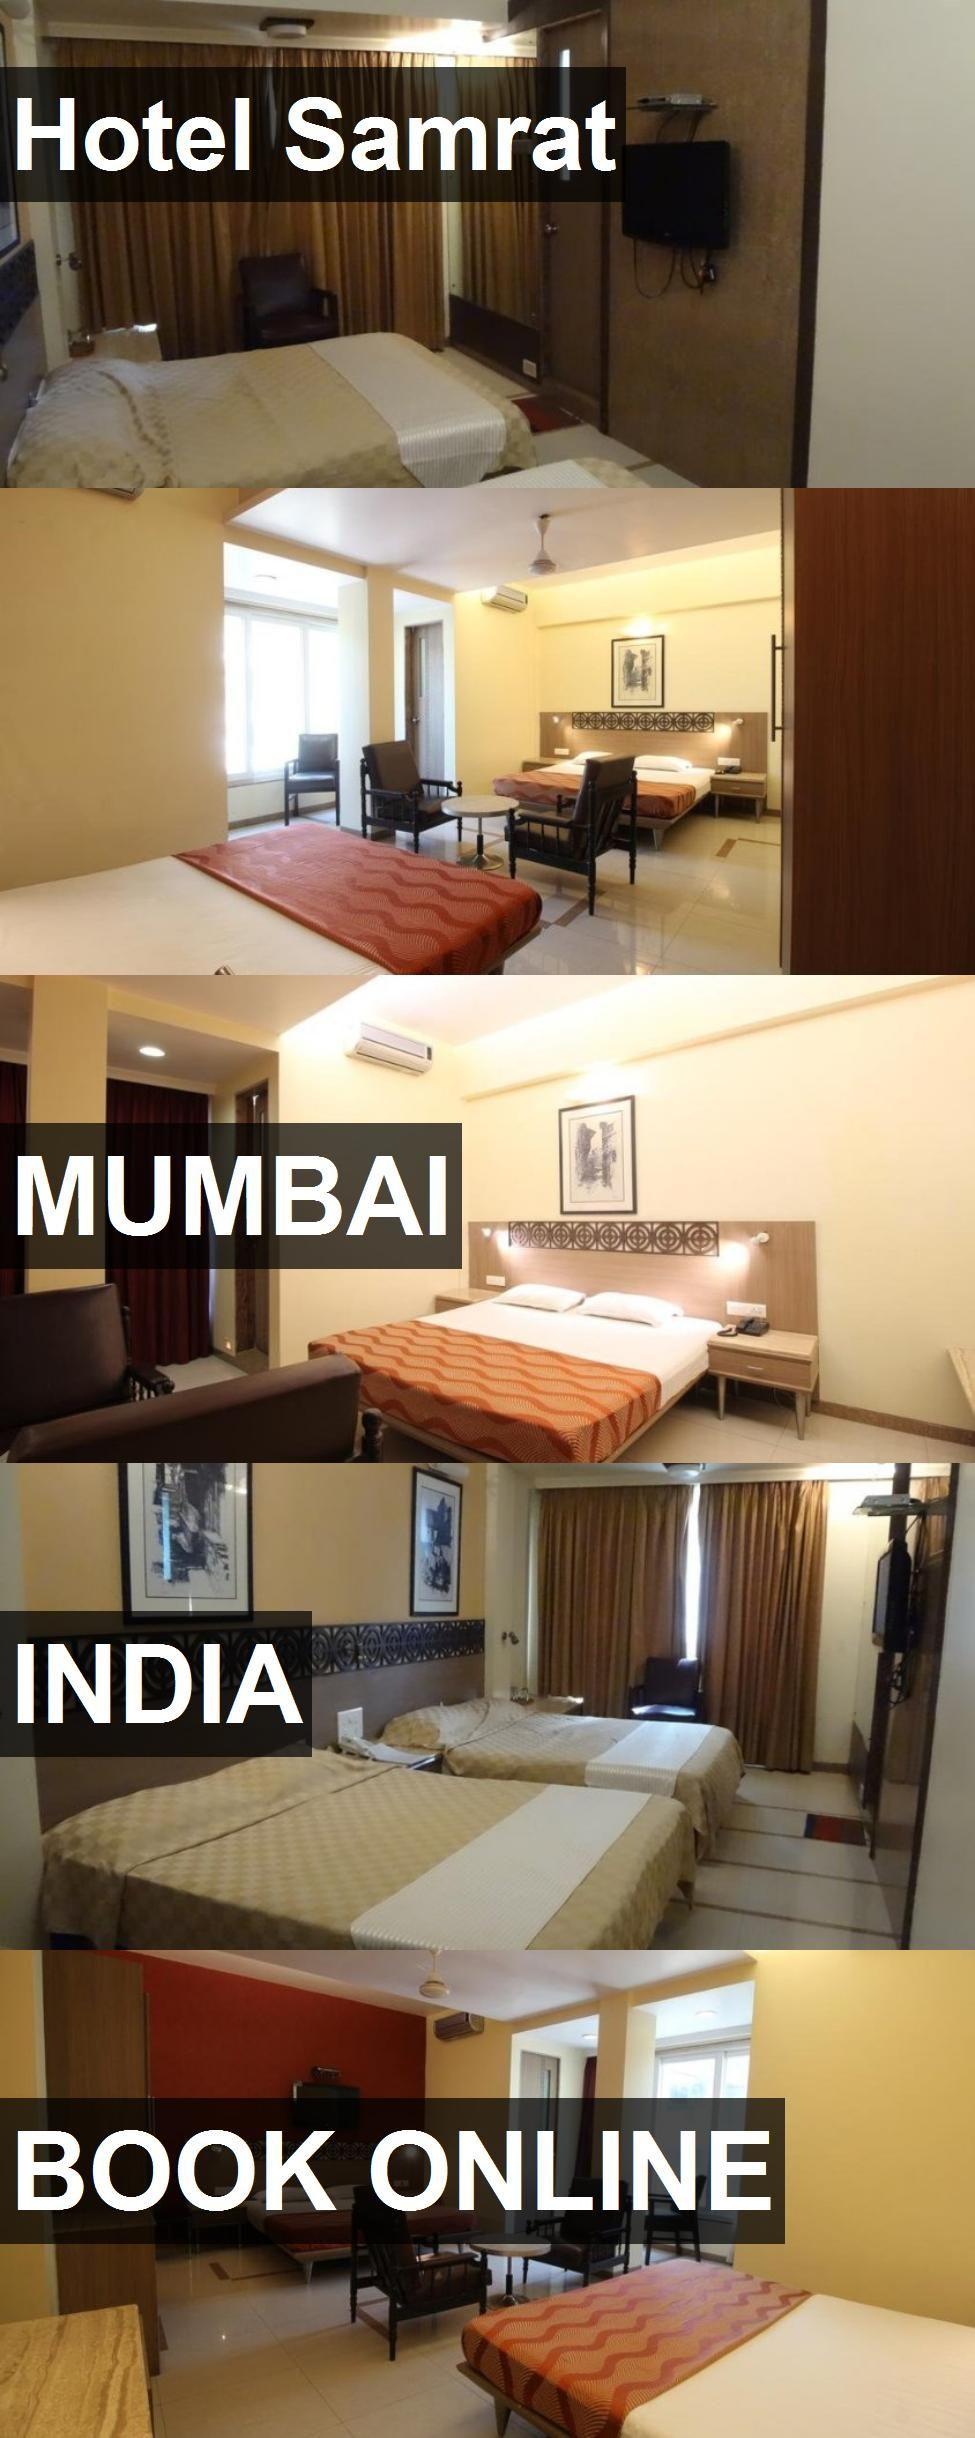 Hotel Samrat in Mumbai, India. For more information